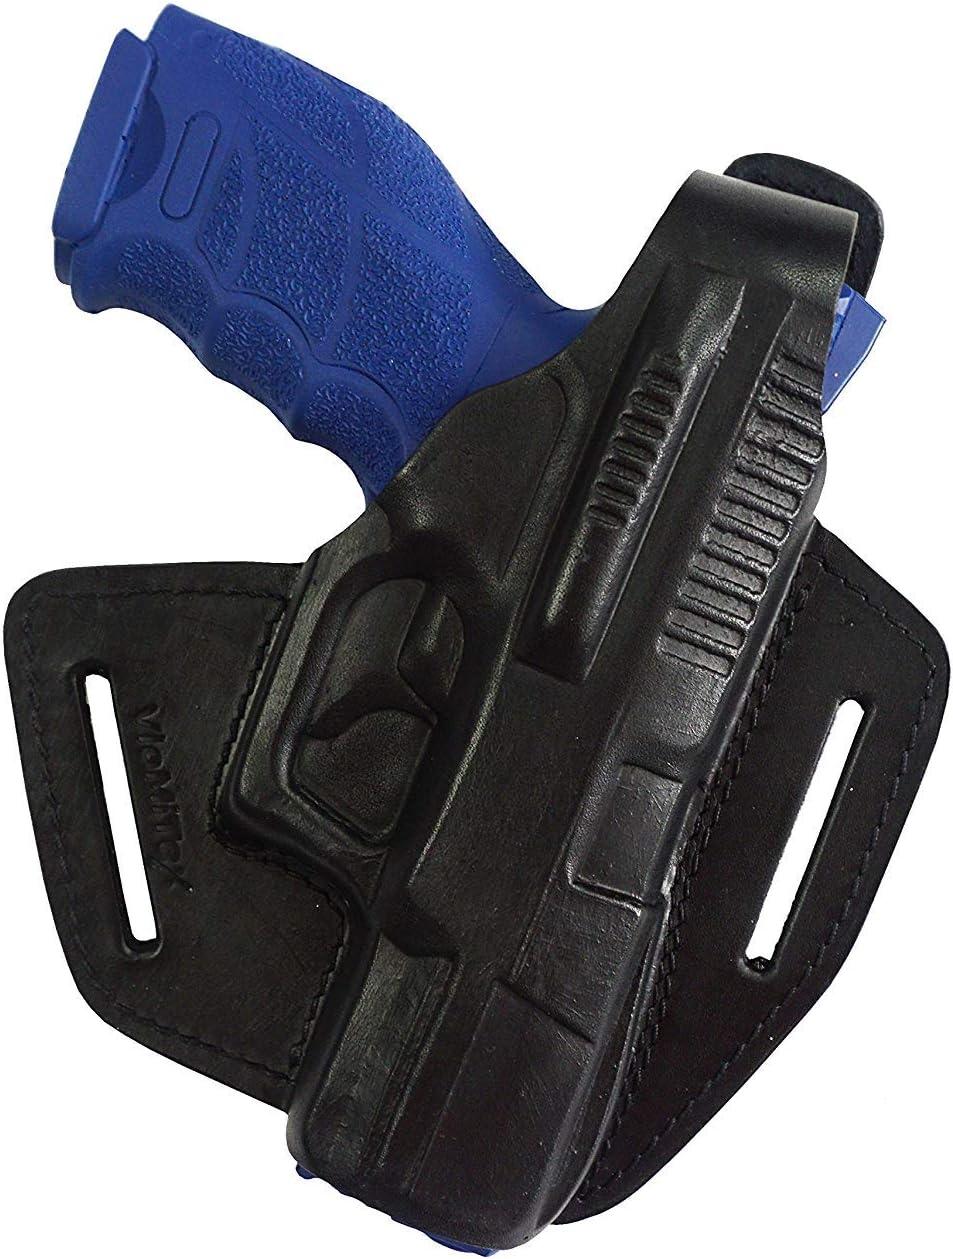 VlaMiTex B5 Pistolera 100% de Cuero, para Pistolas Hekler und Koch SFP9, VP9 y HK, Negro